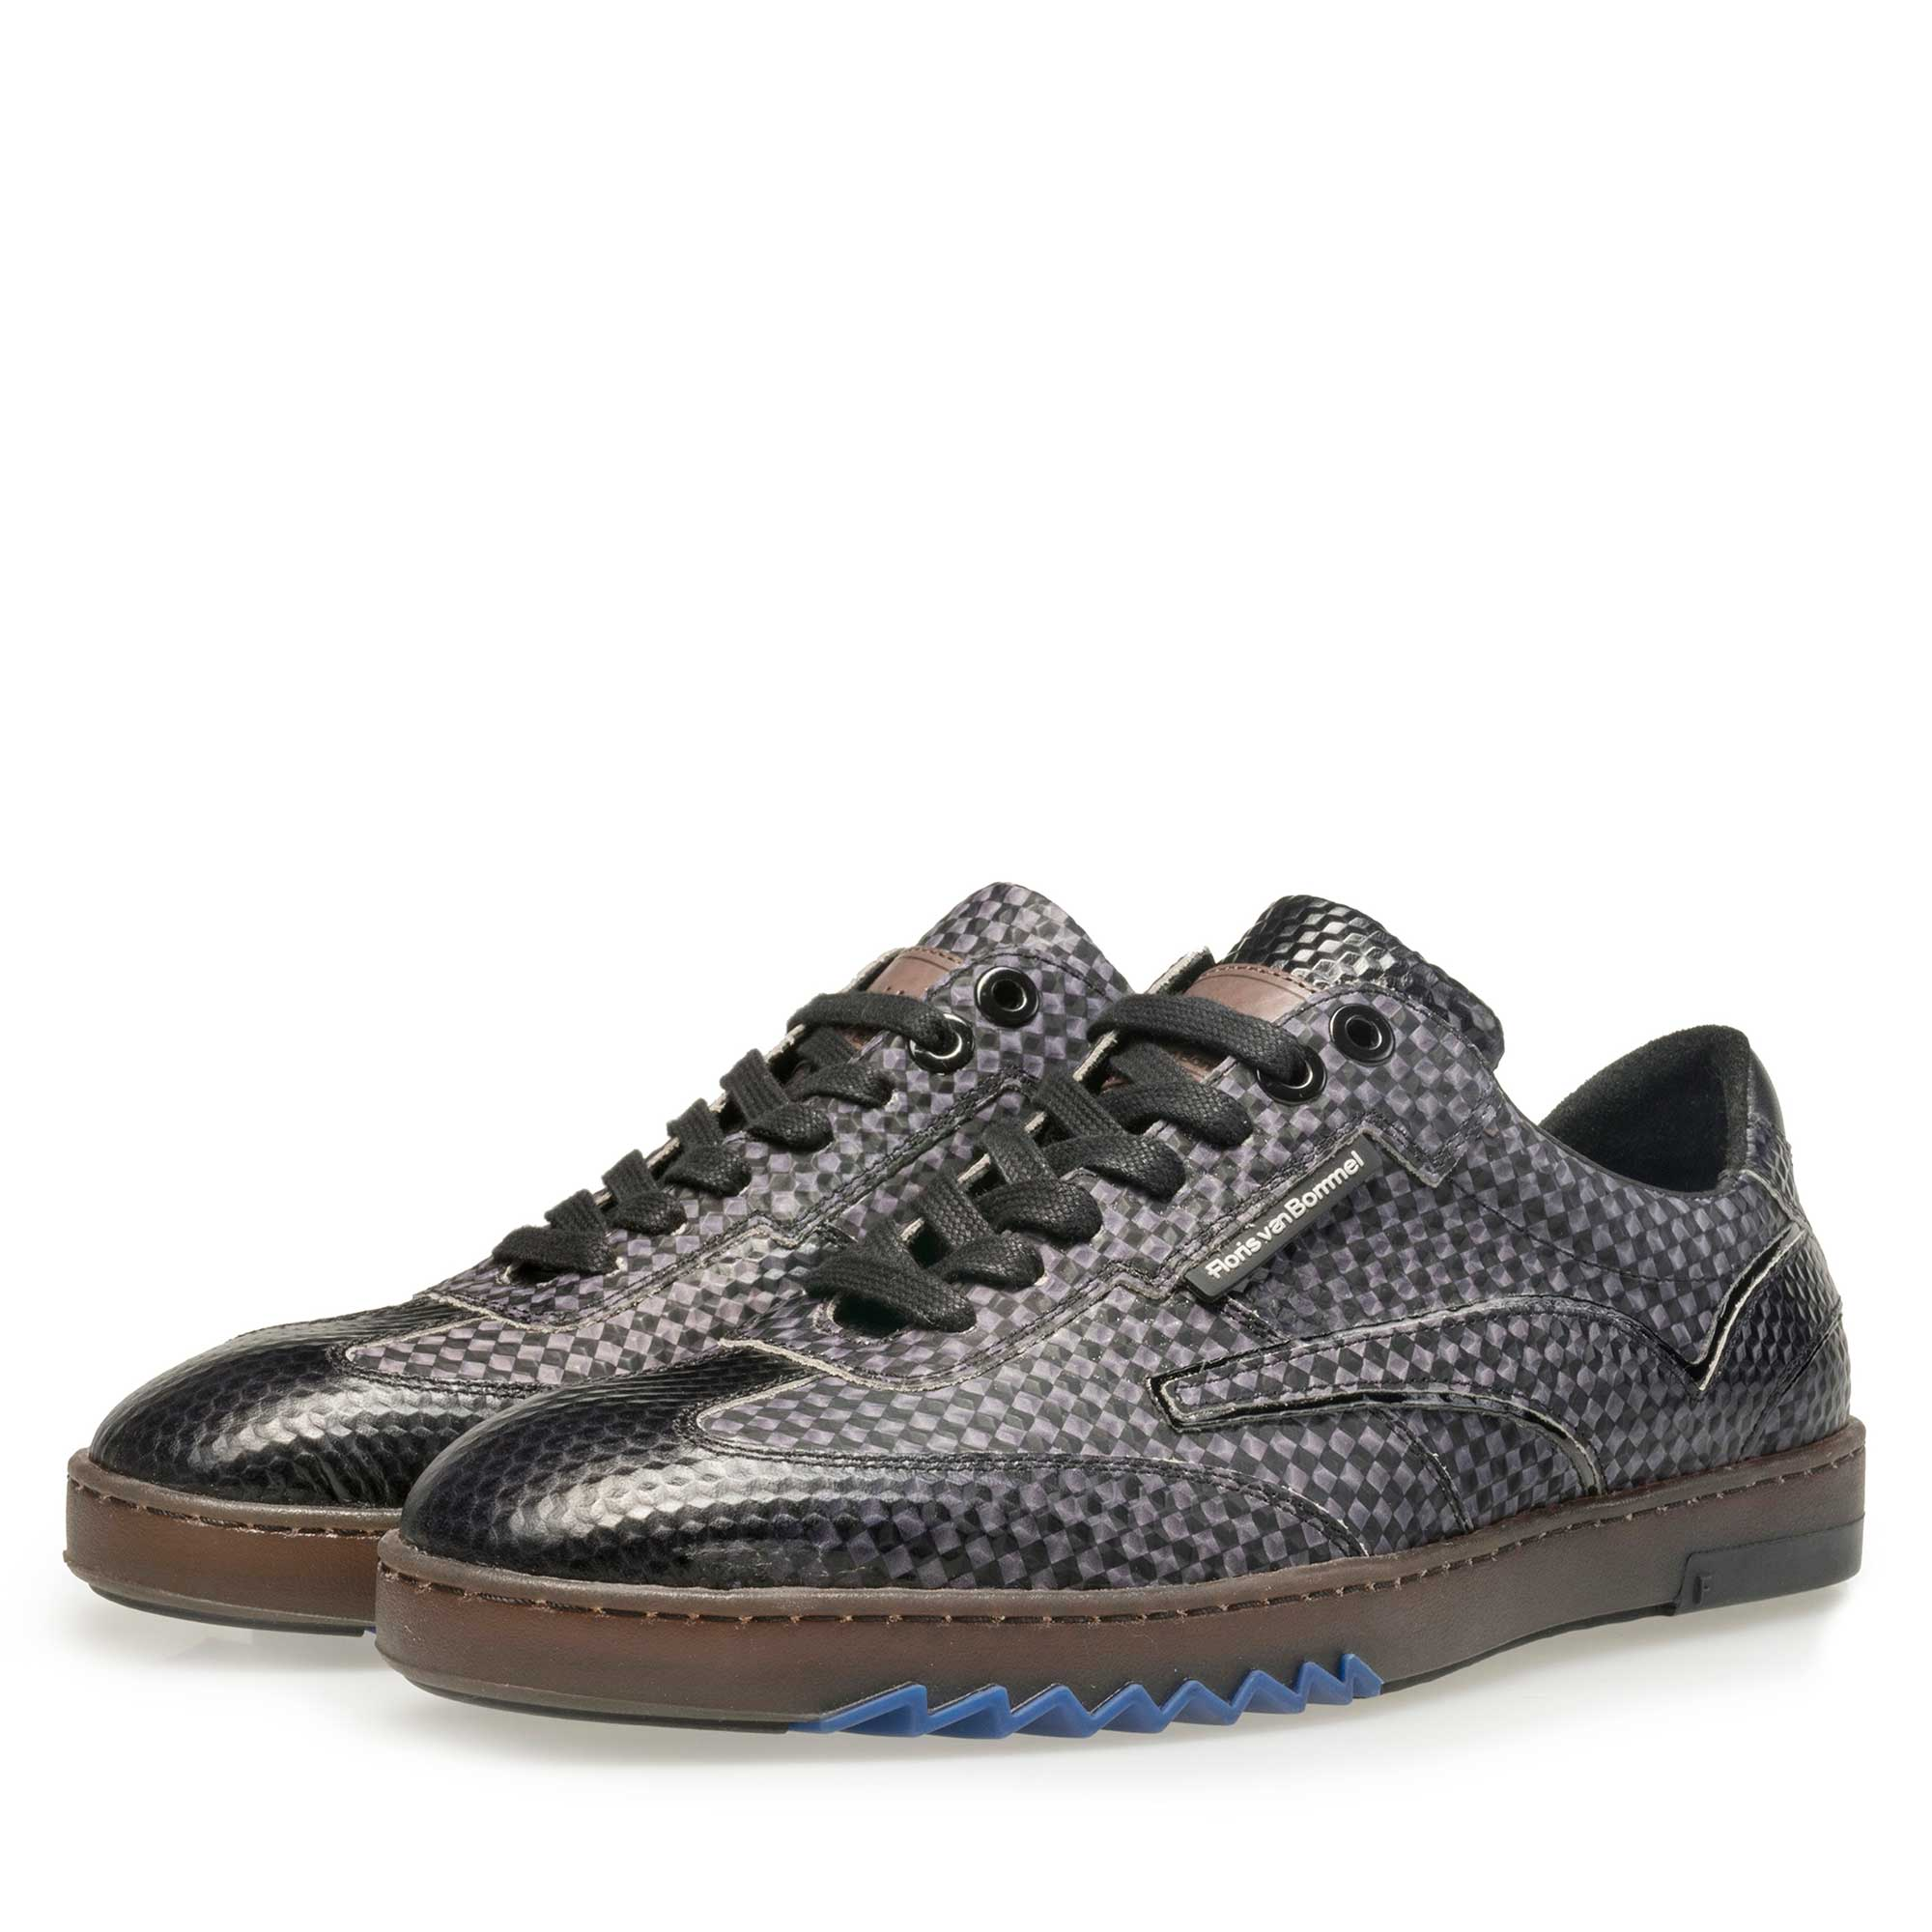 Chaussures De Sport Floris Van Bommel Hommes (noir) ELtNa